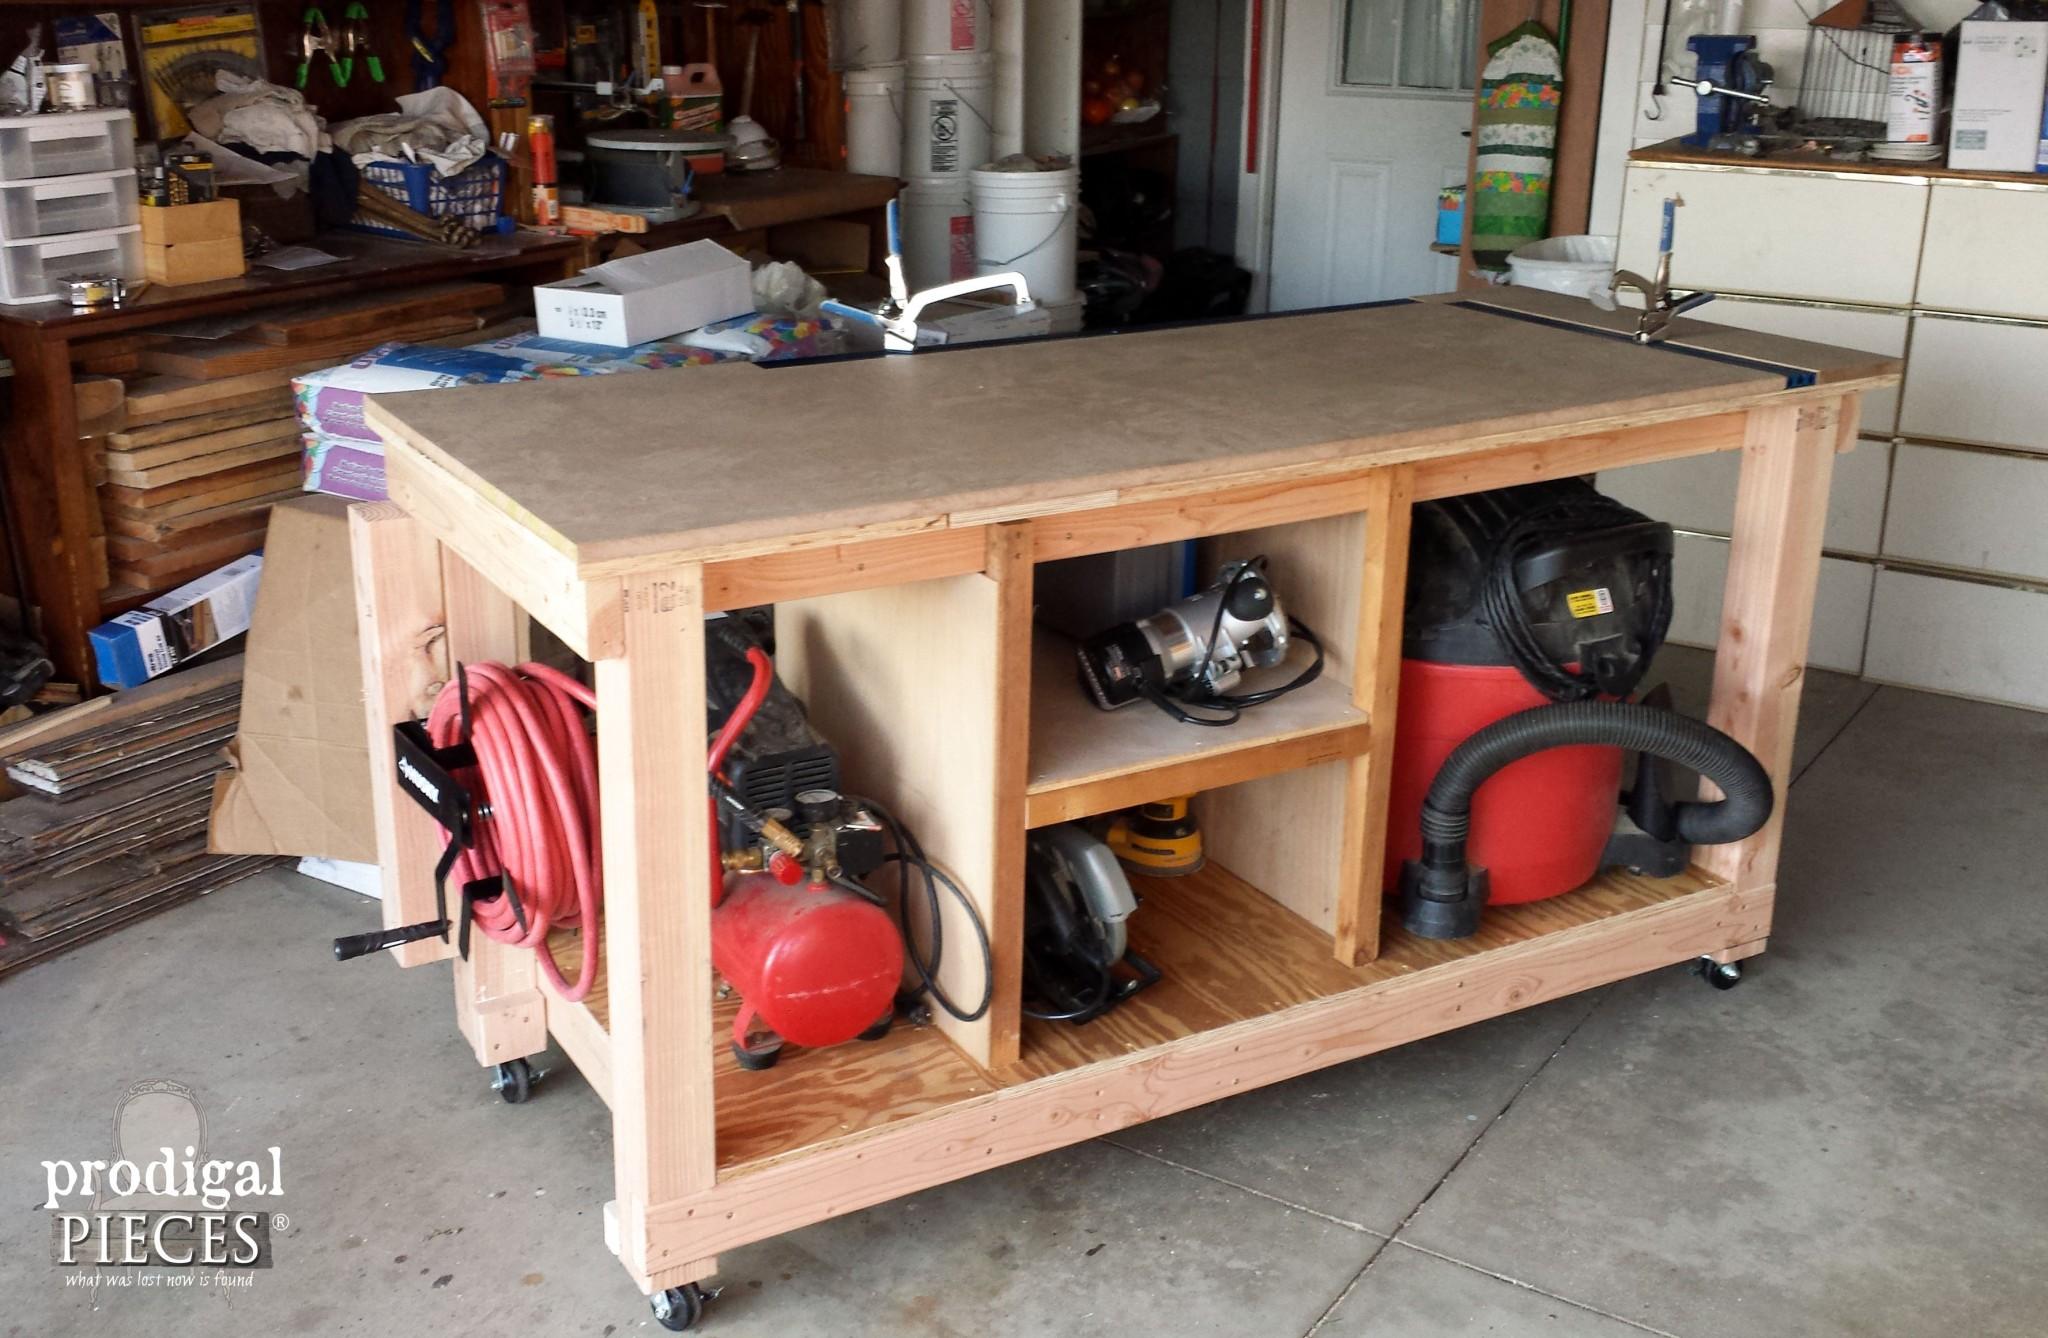 Awe Inspiring Diy Workbench Fit For A Junker Prodigal Pieces Creativecarmelina Interior Chair Design Creativecarmelinacom